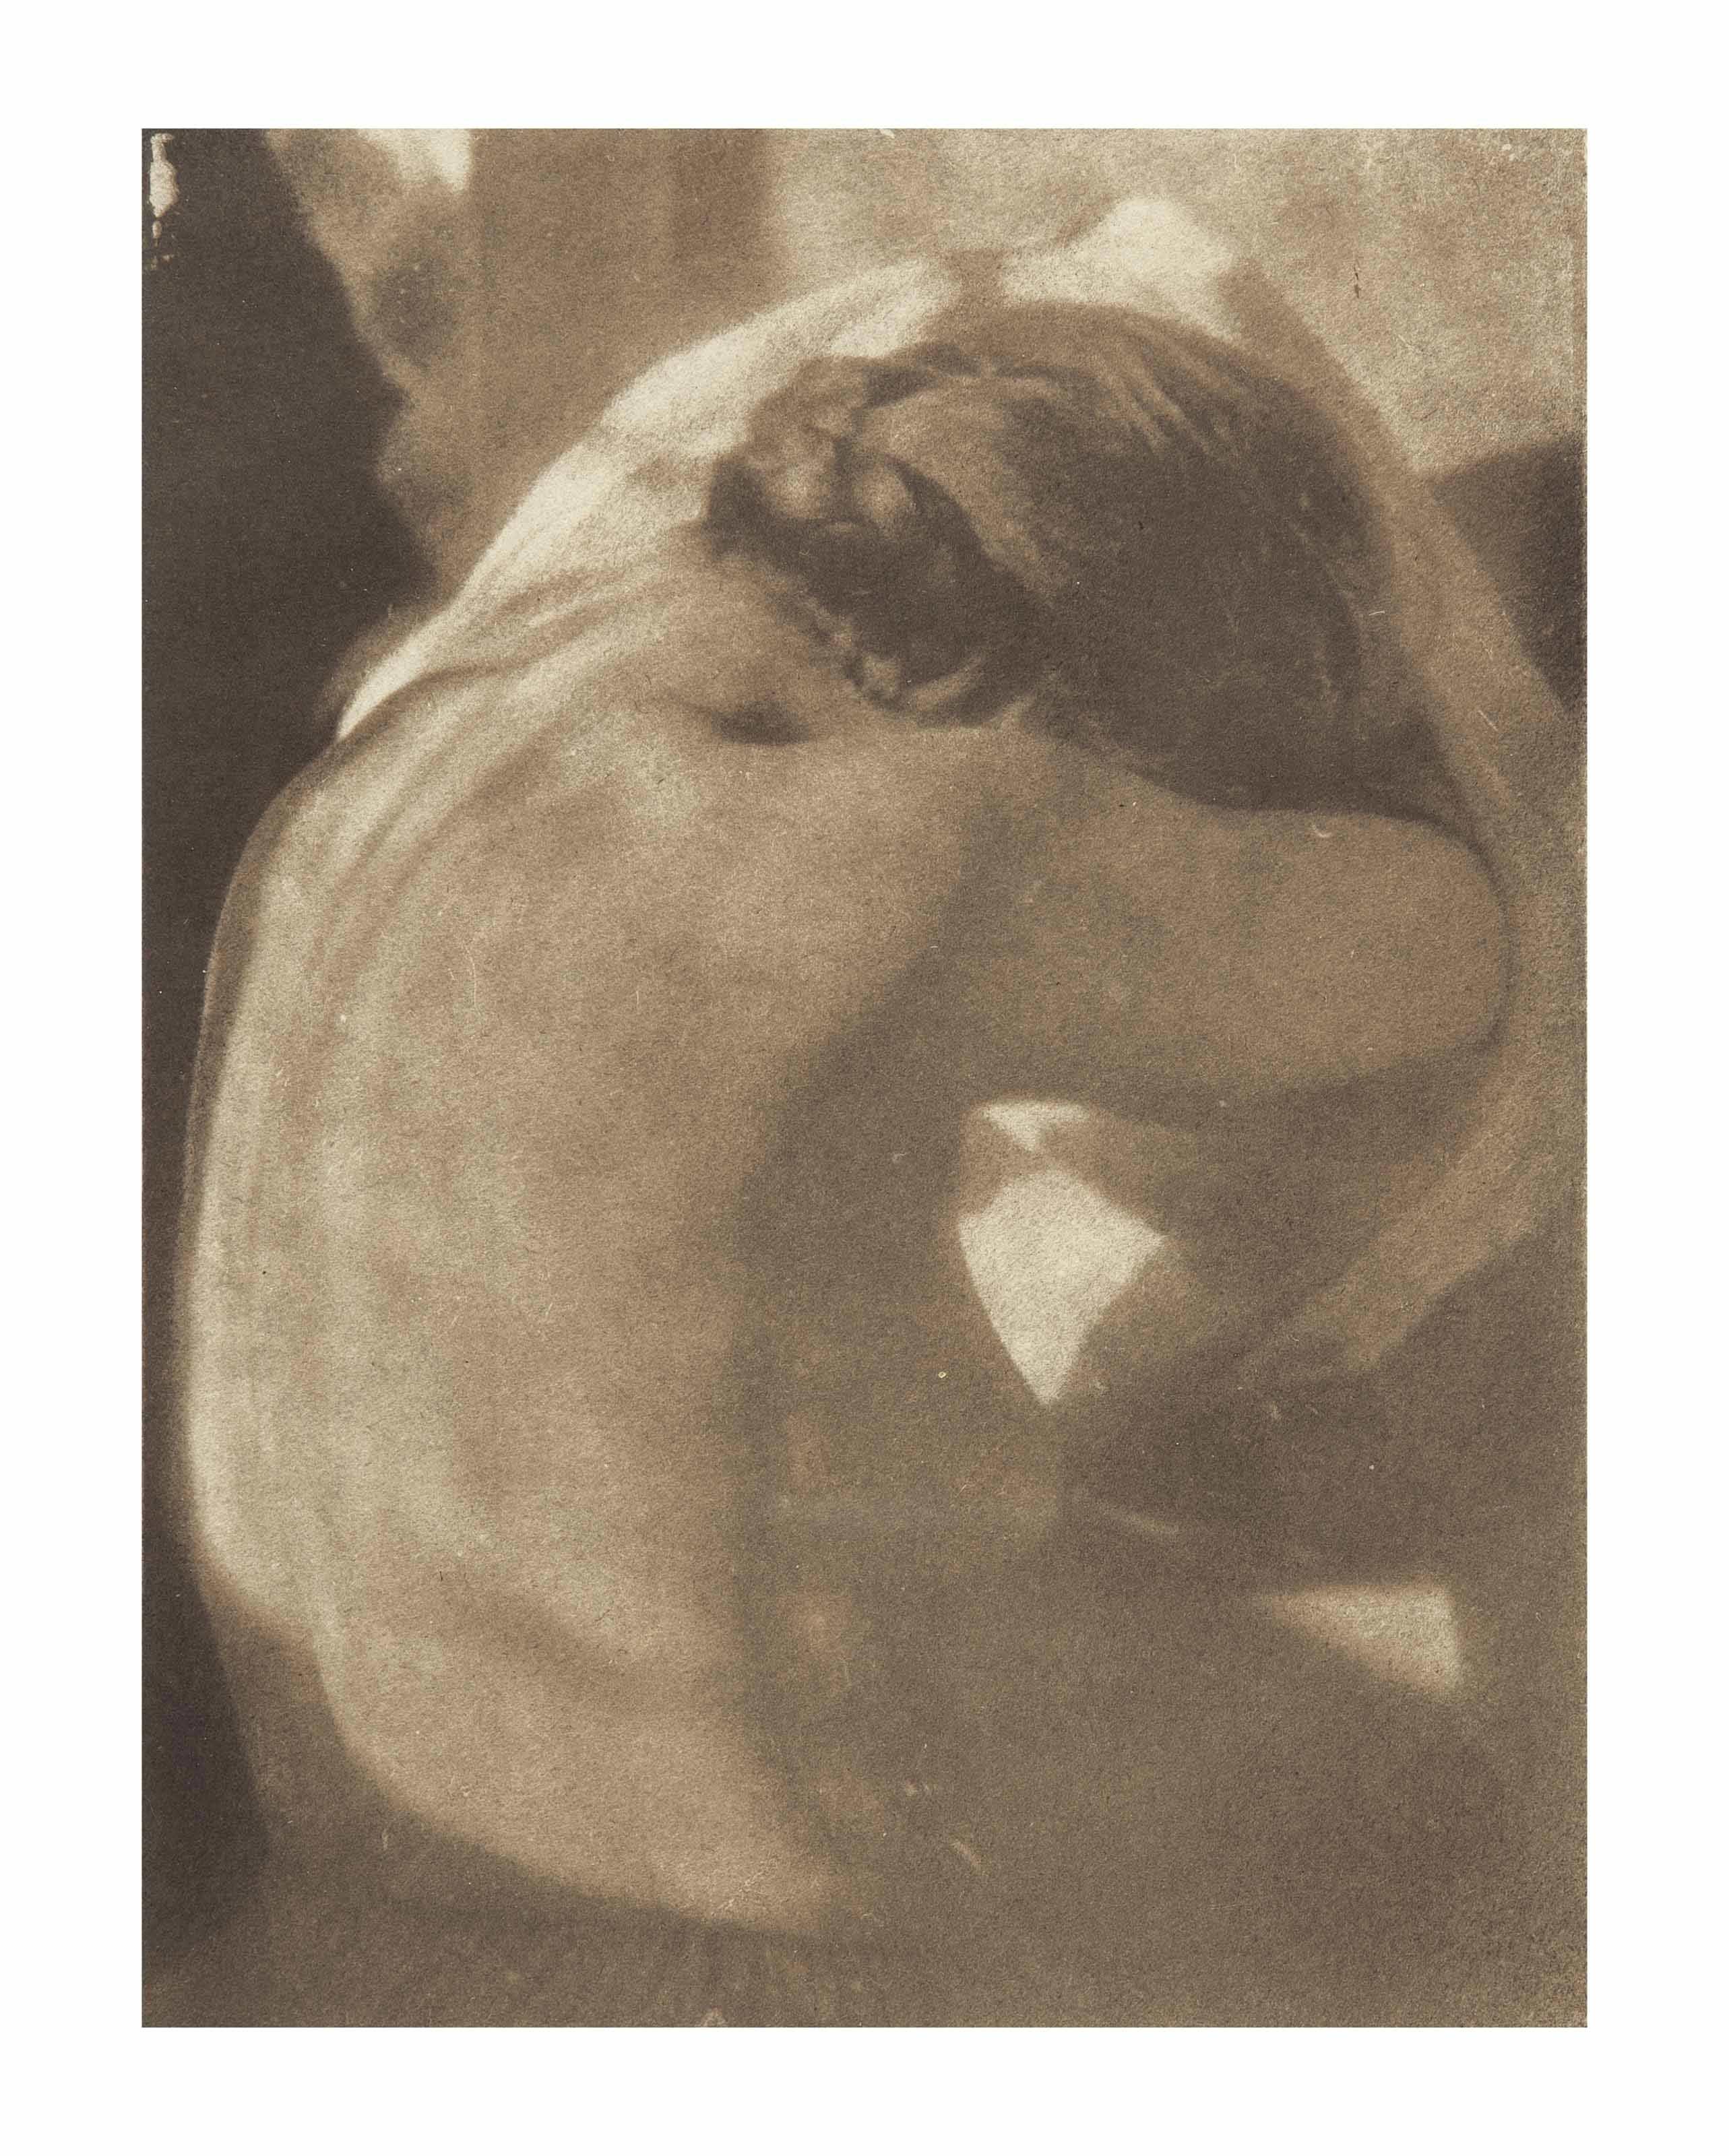 Nude in Sunlight, c. 1920